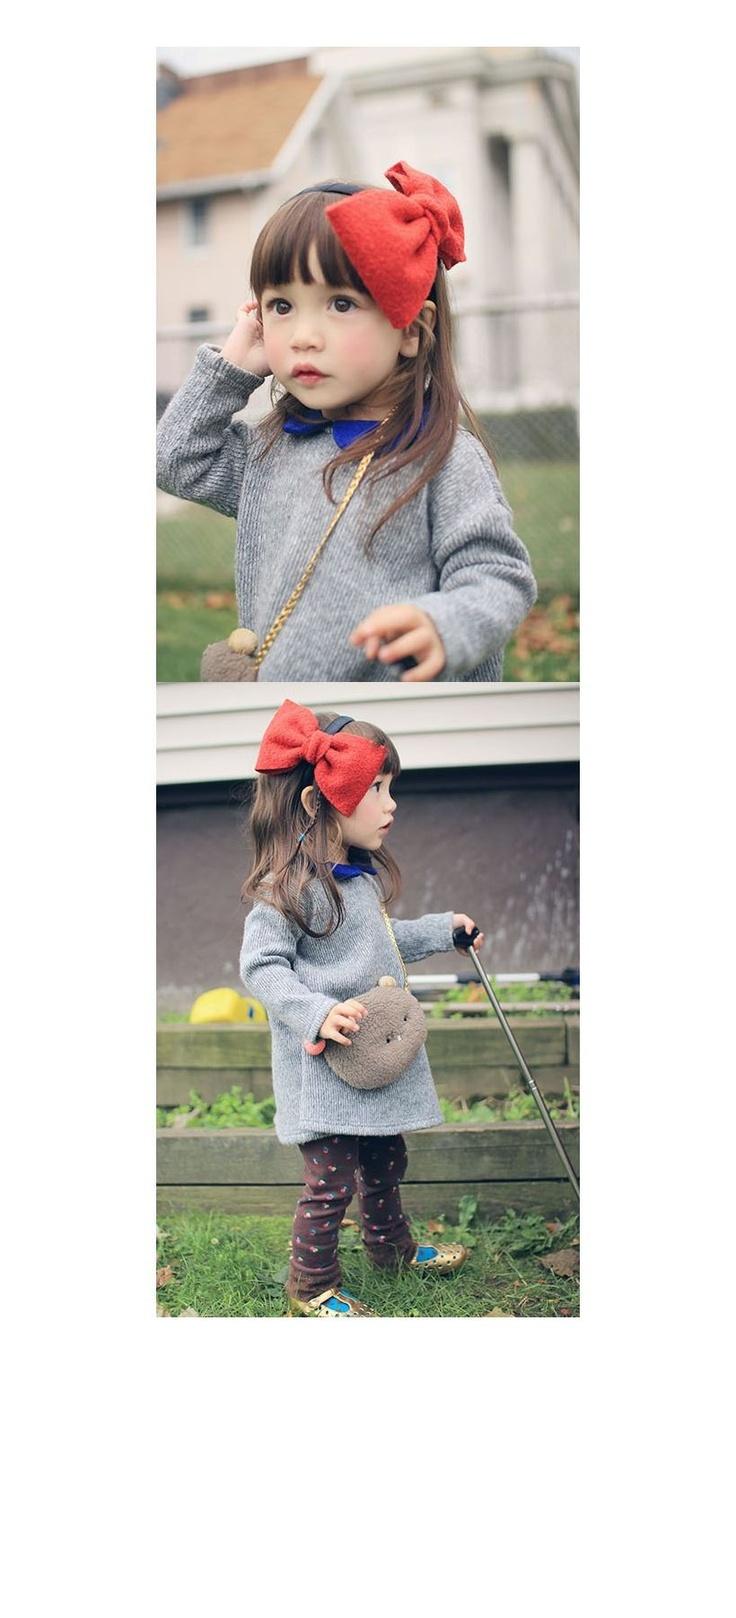 annikaアニカ ベルディワンピース - 韓国子供服amber,annikaのtsubomiかわいい輸入服のセレクトショップ